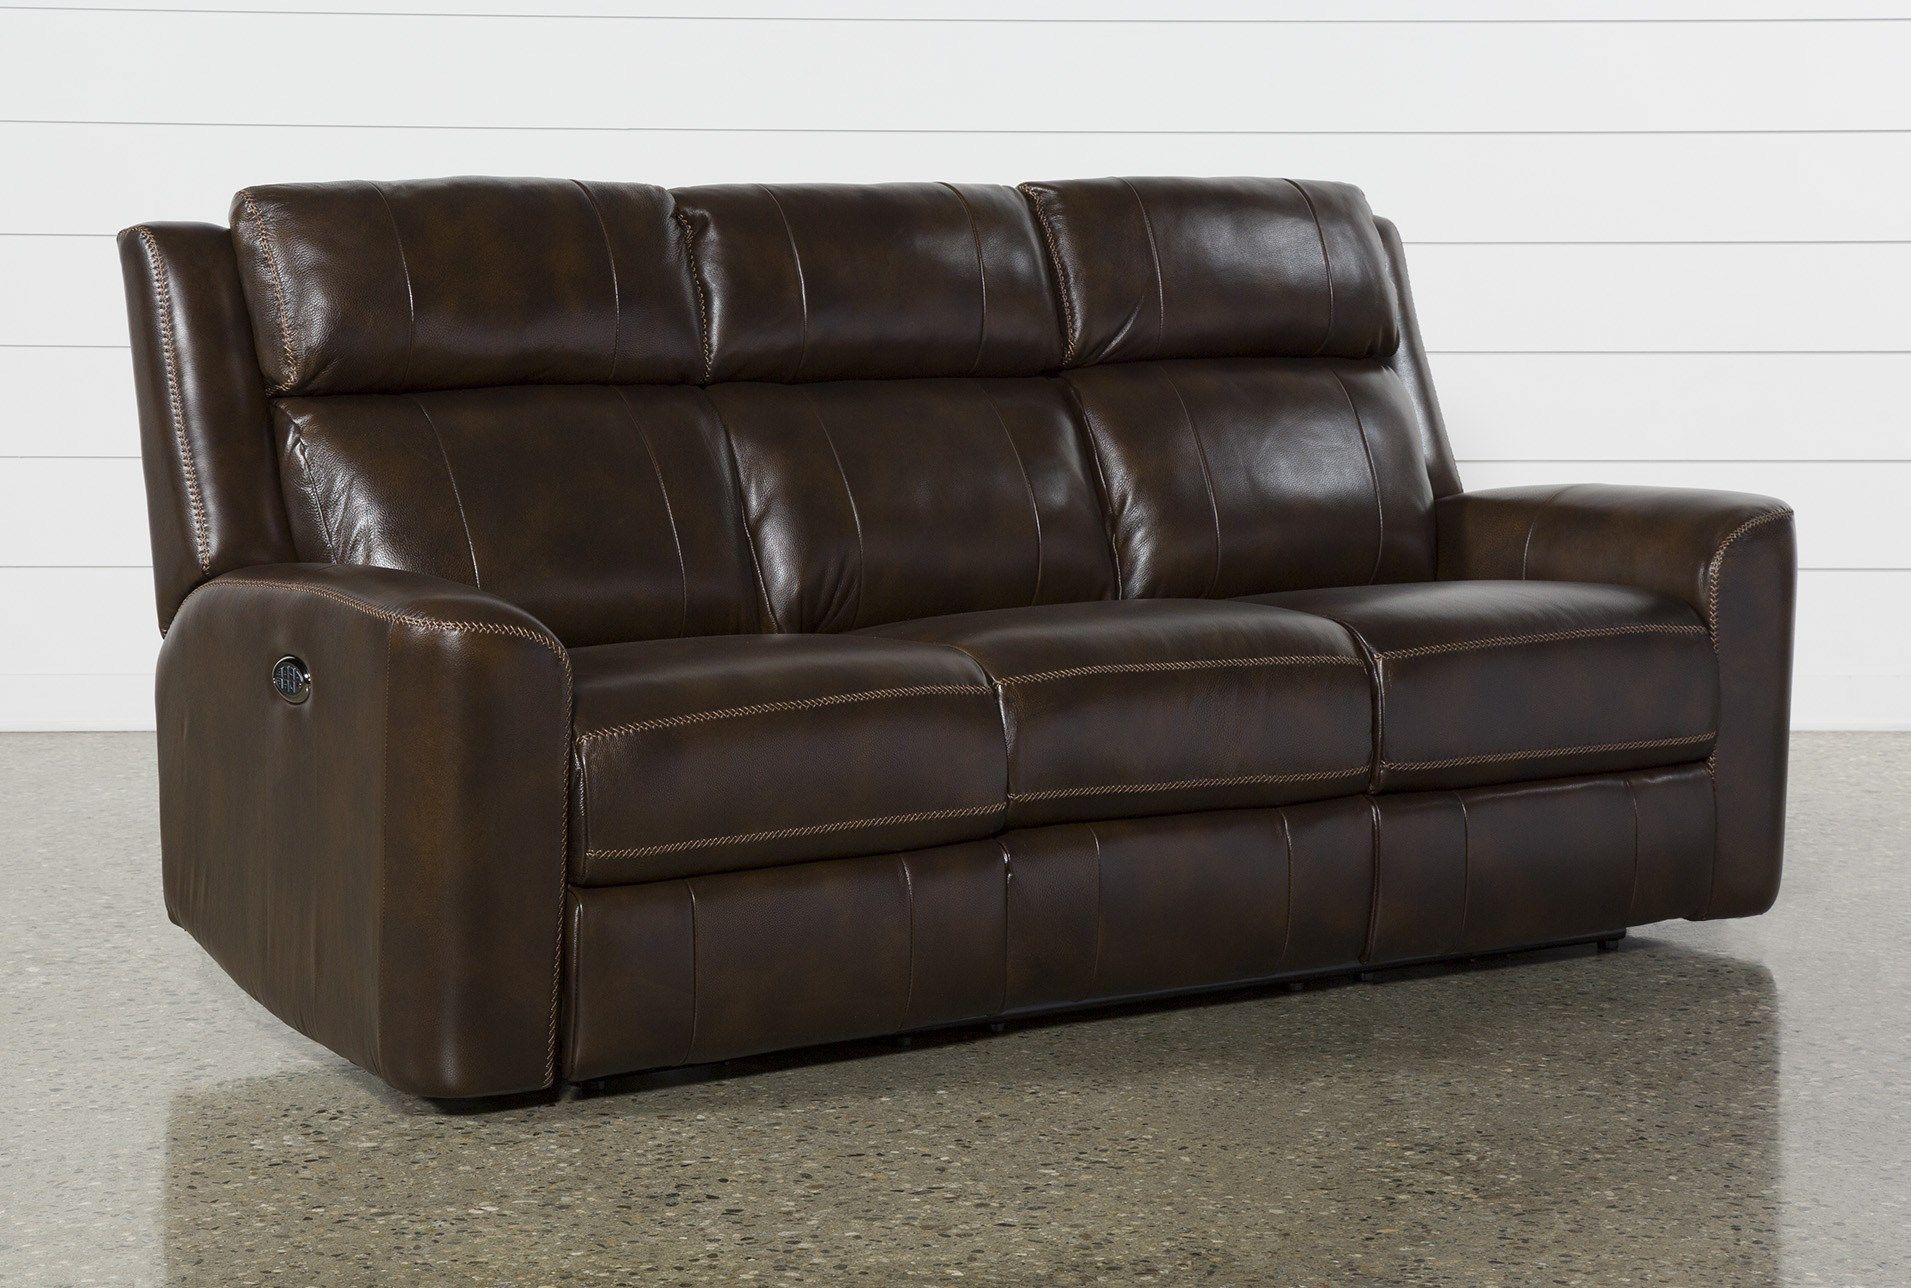 Stetson Leather Power Reclining Sofa W Power Headrest Lumbar Reclining Sofa Power Recliners Power Reclining Sofa